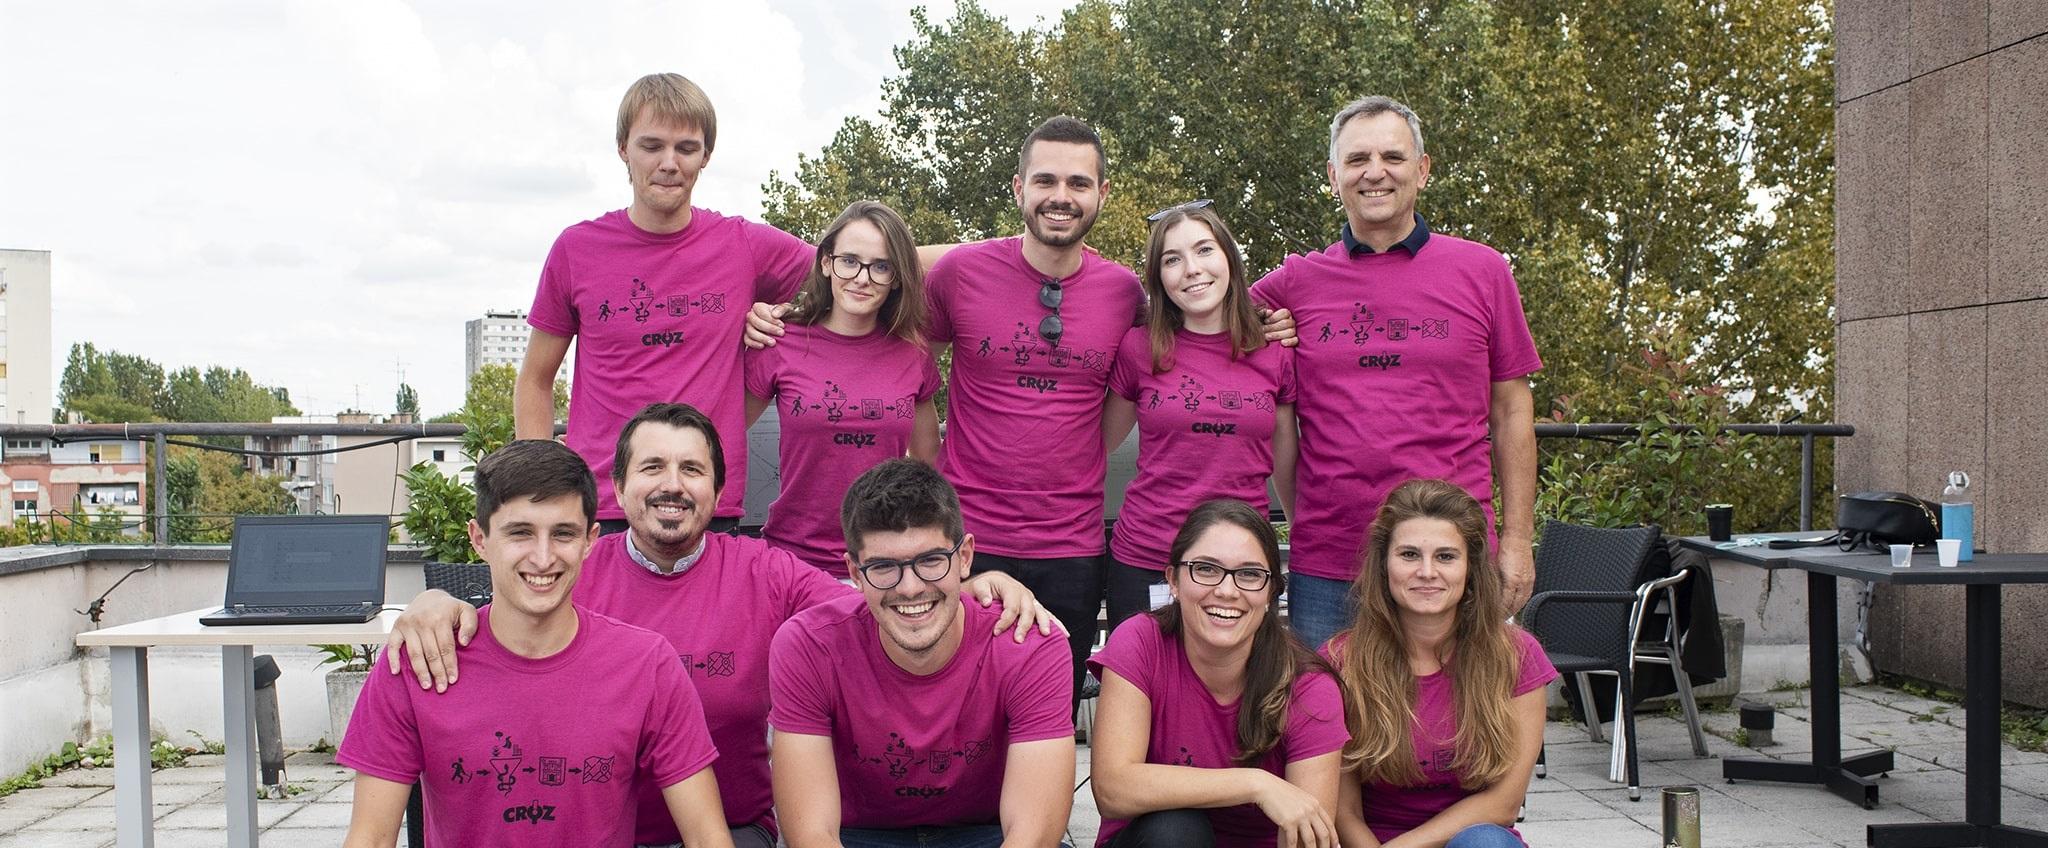 It's all about data – summer internship at CROZ